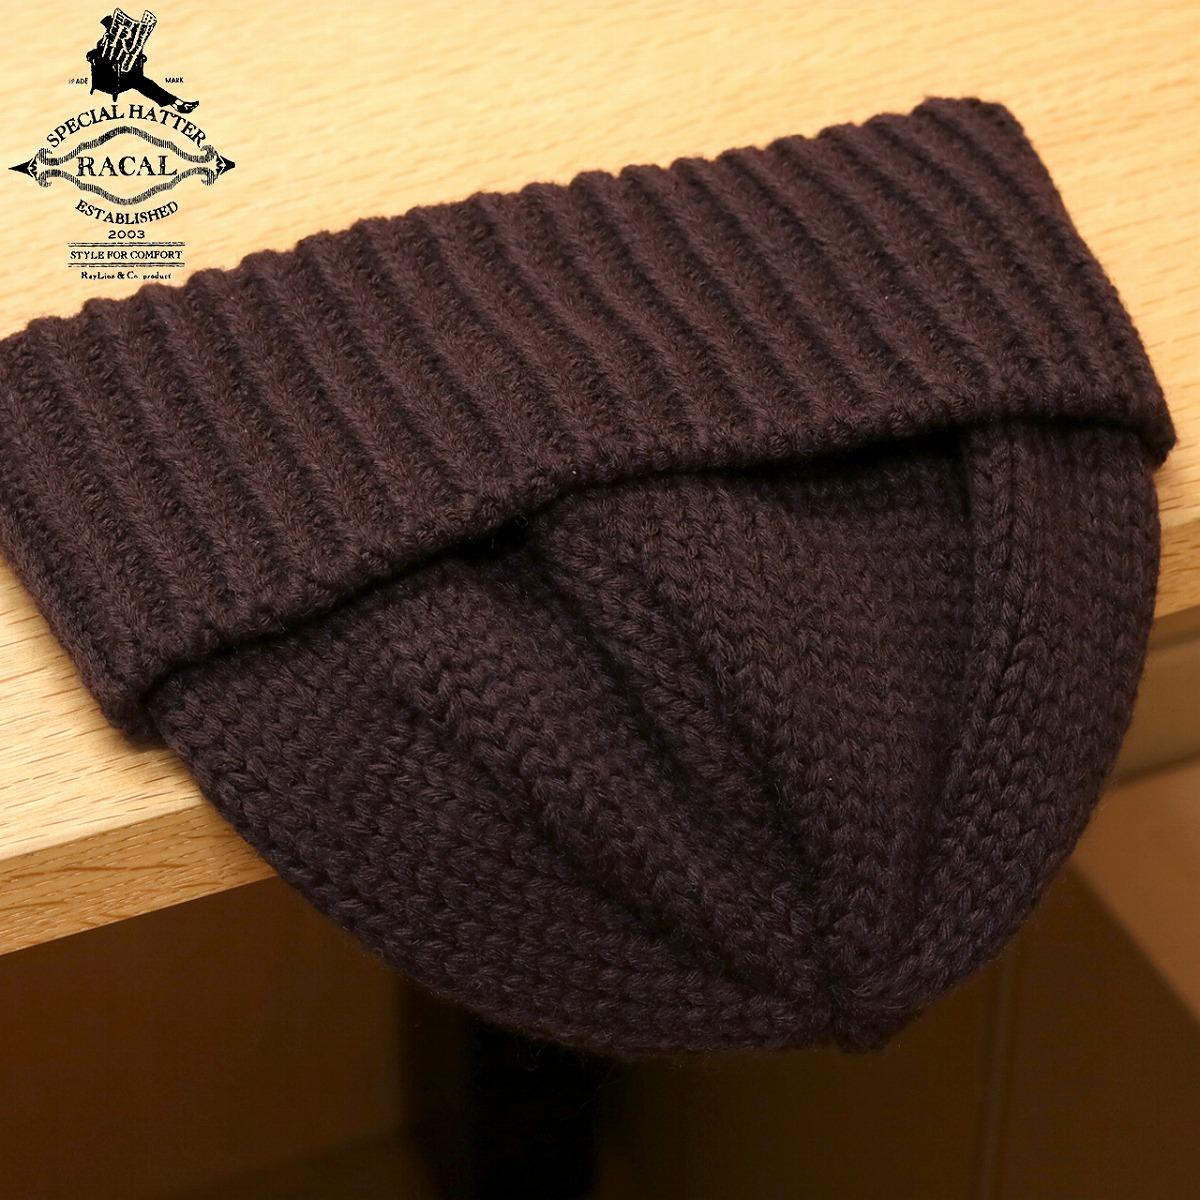 d94e4e636b572 Plain adjustable size men brand Shin pull coordinates   tea brown  beanie  cap  Christmas gift present made in hat knit men ラカルニット hat racal ニット ...